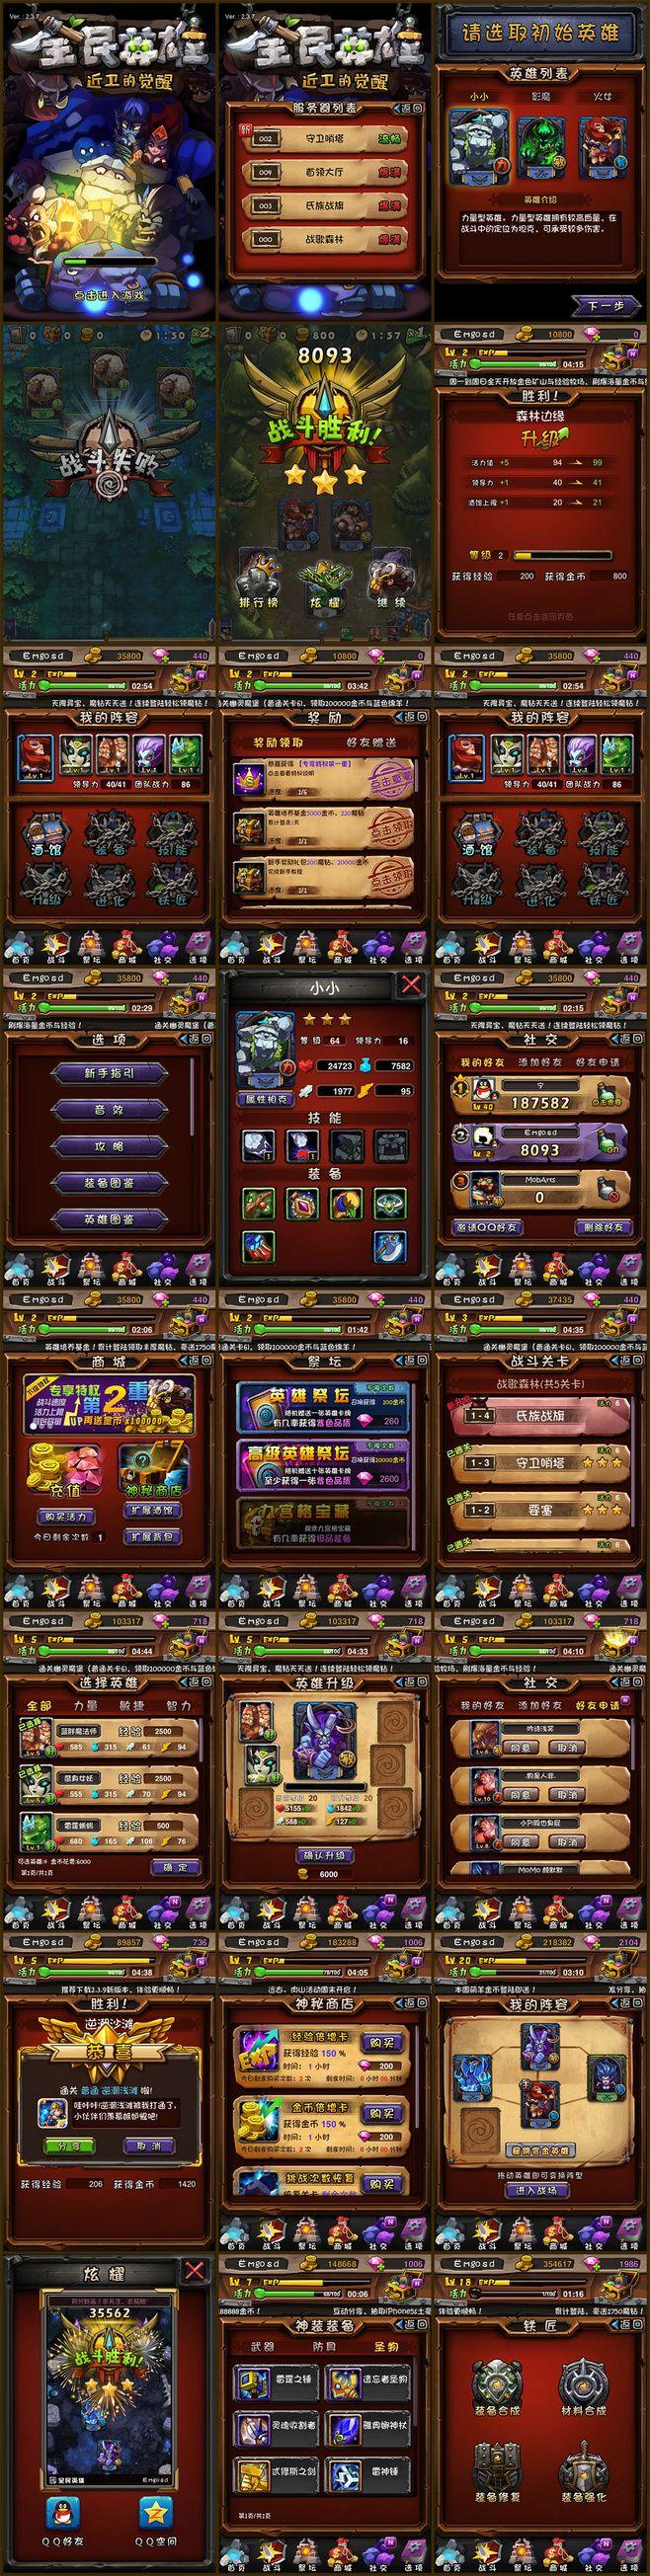 Азиатские менюшки [National Heroes] interface screenshot | GAMEUI-...